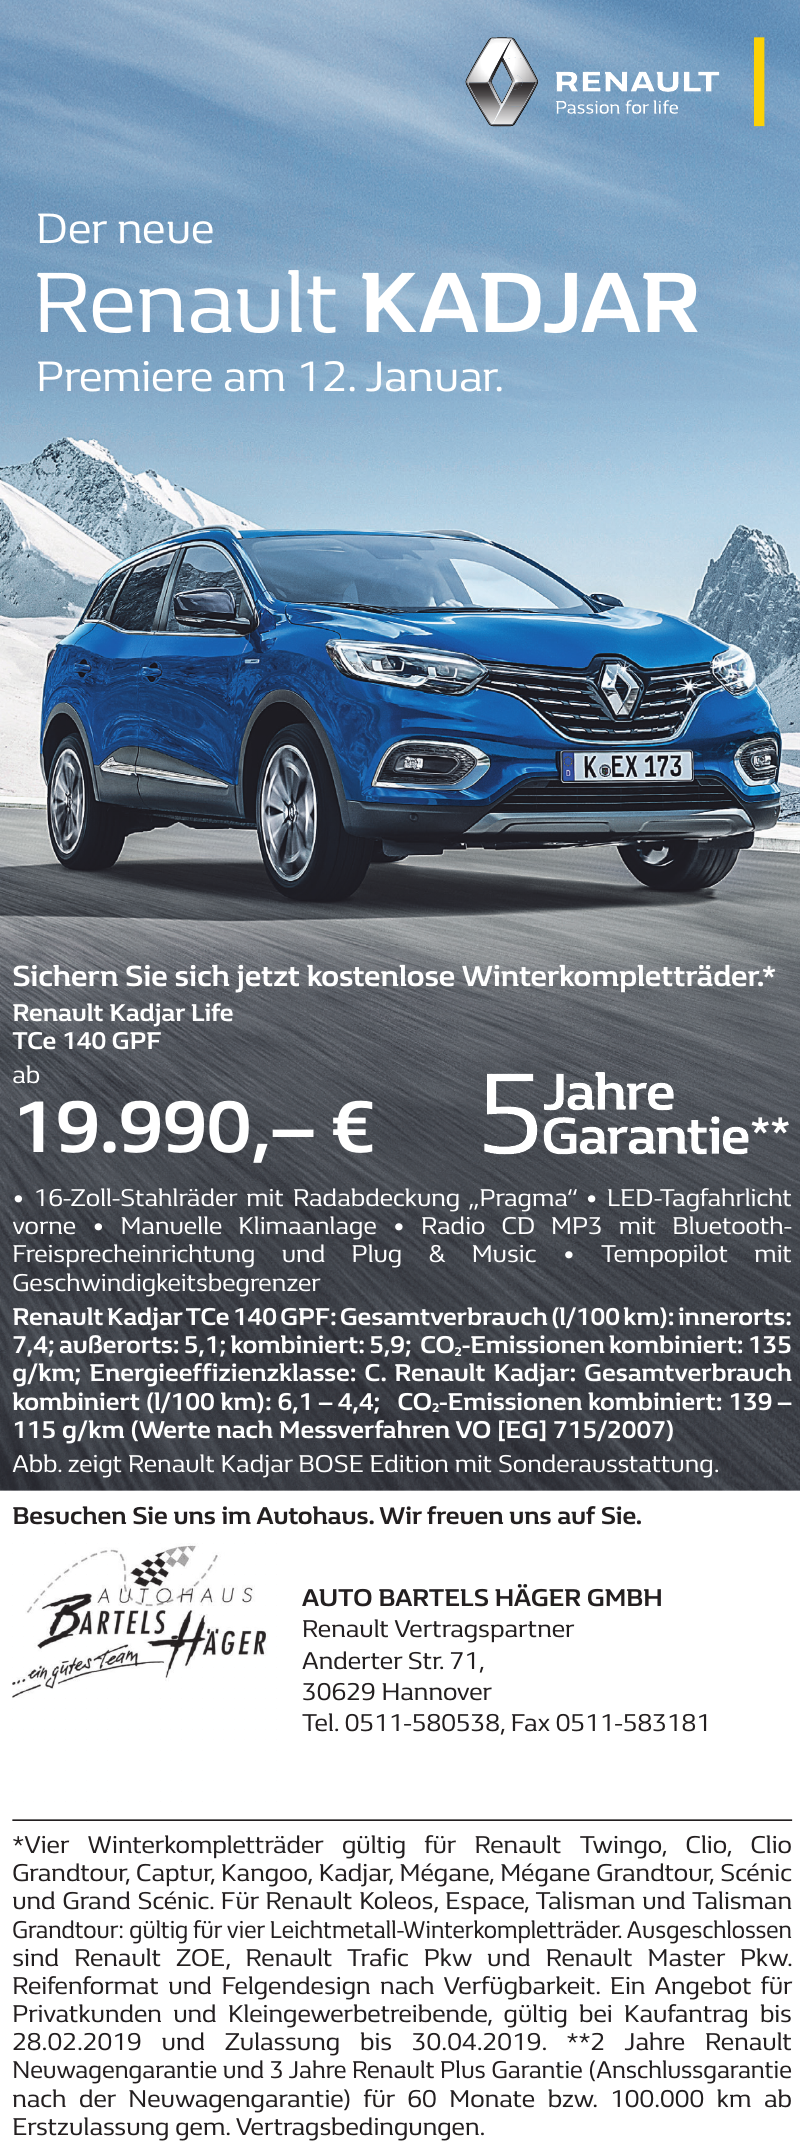 Auto Bartels Häger GmbH Renault Vertragspartner